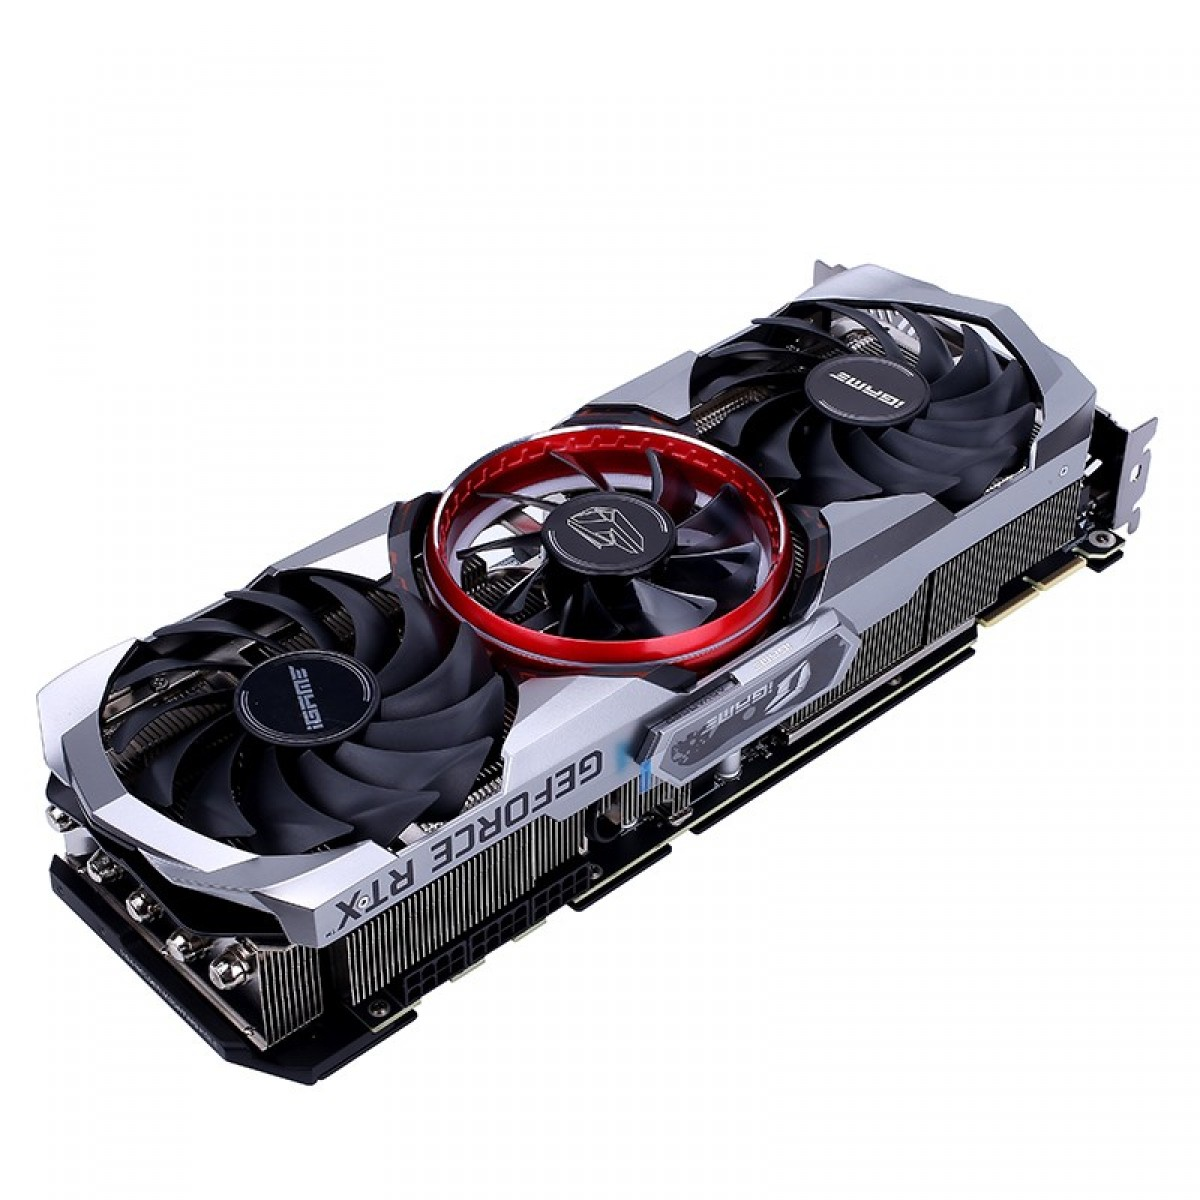 Placa de Vídeo Colorful, GeForce, iGame RTX 3090 Advanced OC-V, 24GB, GDDR6X, 384Bit, 212326114801